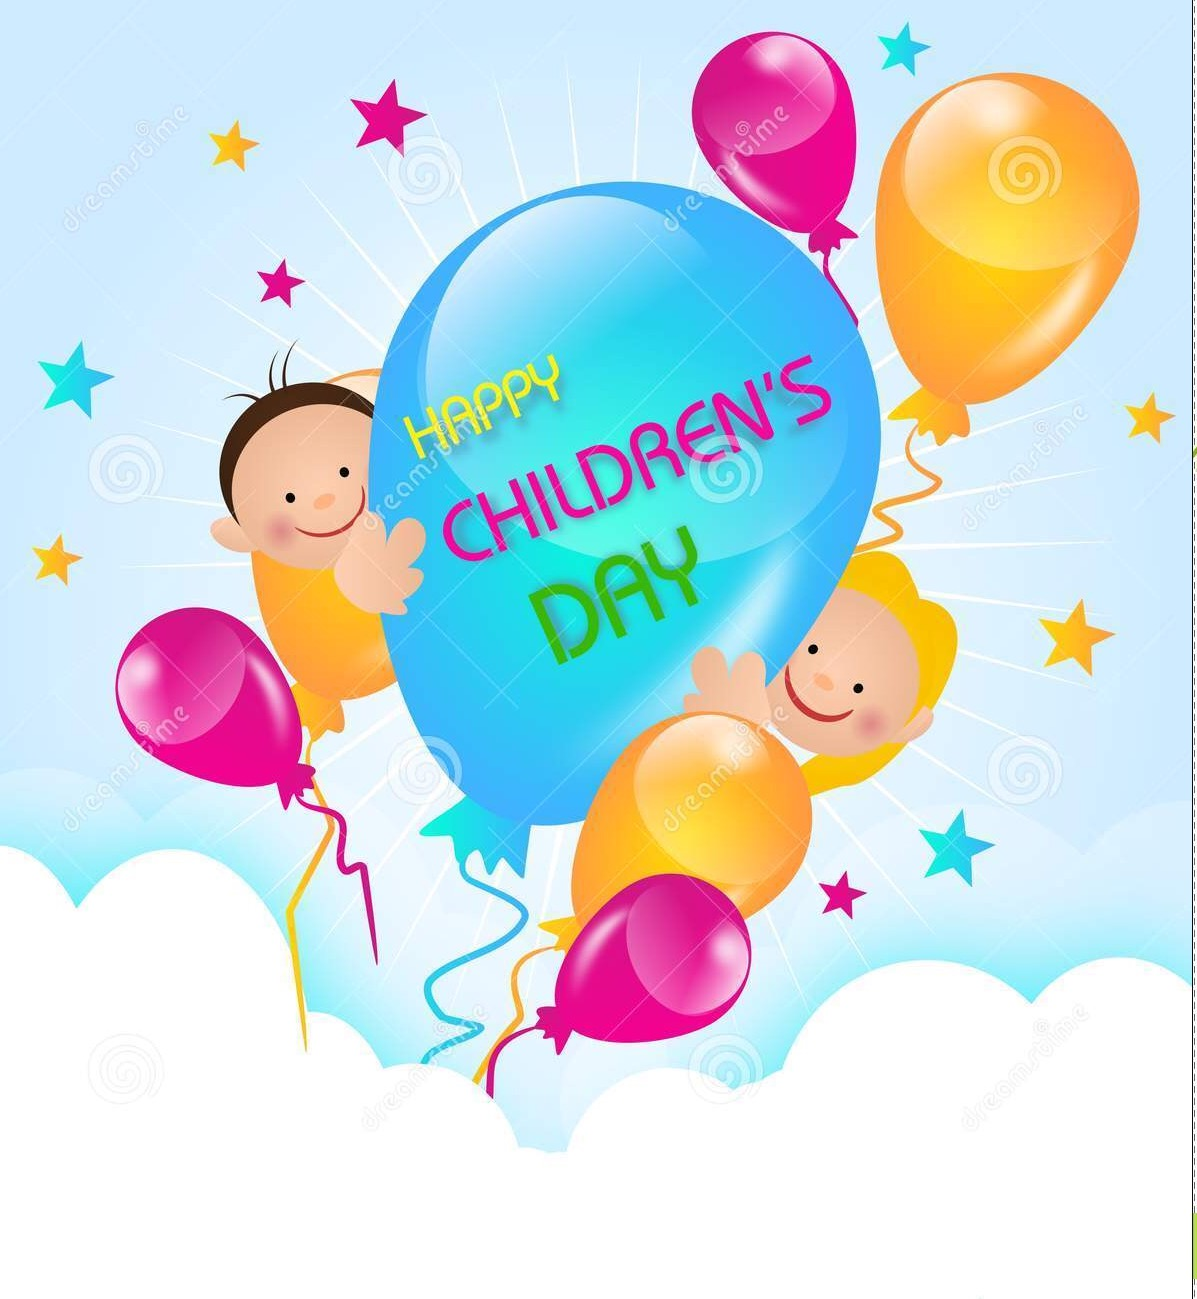 Korea clipart children's day O L Network Korea! Happy